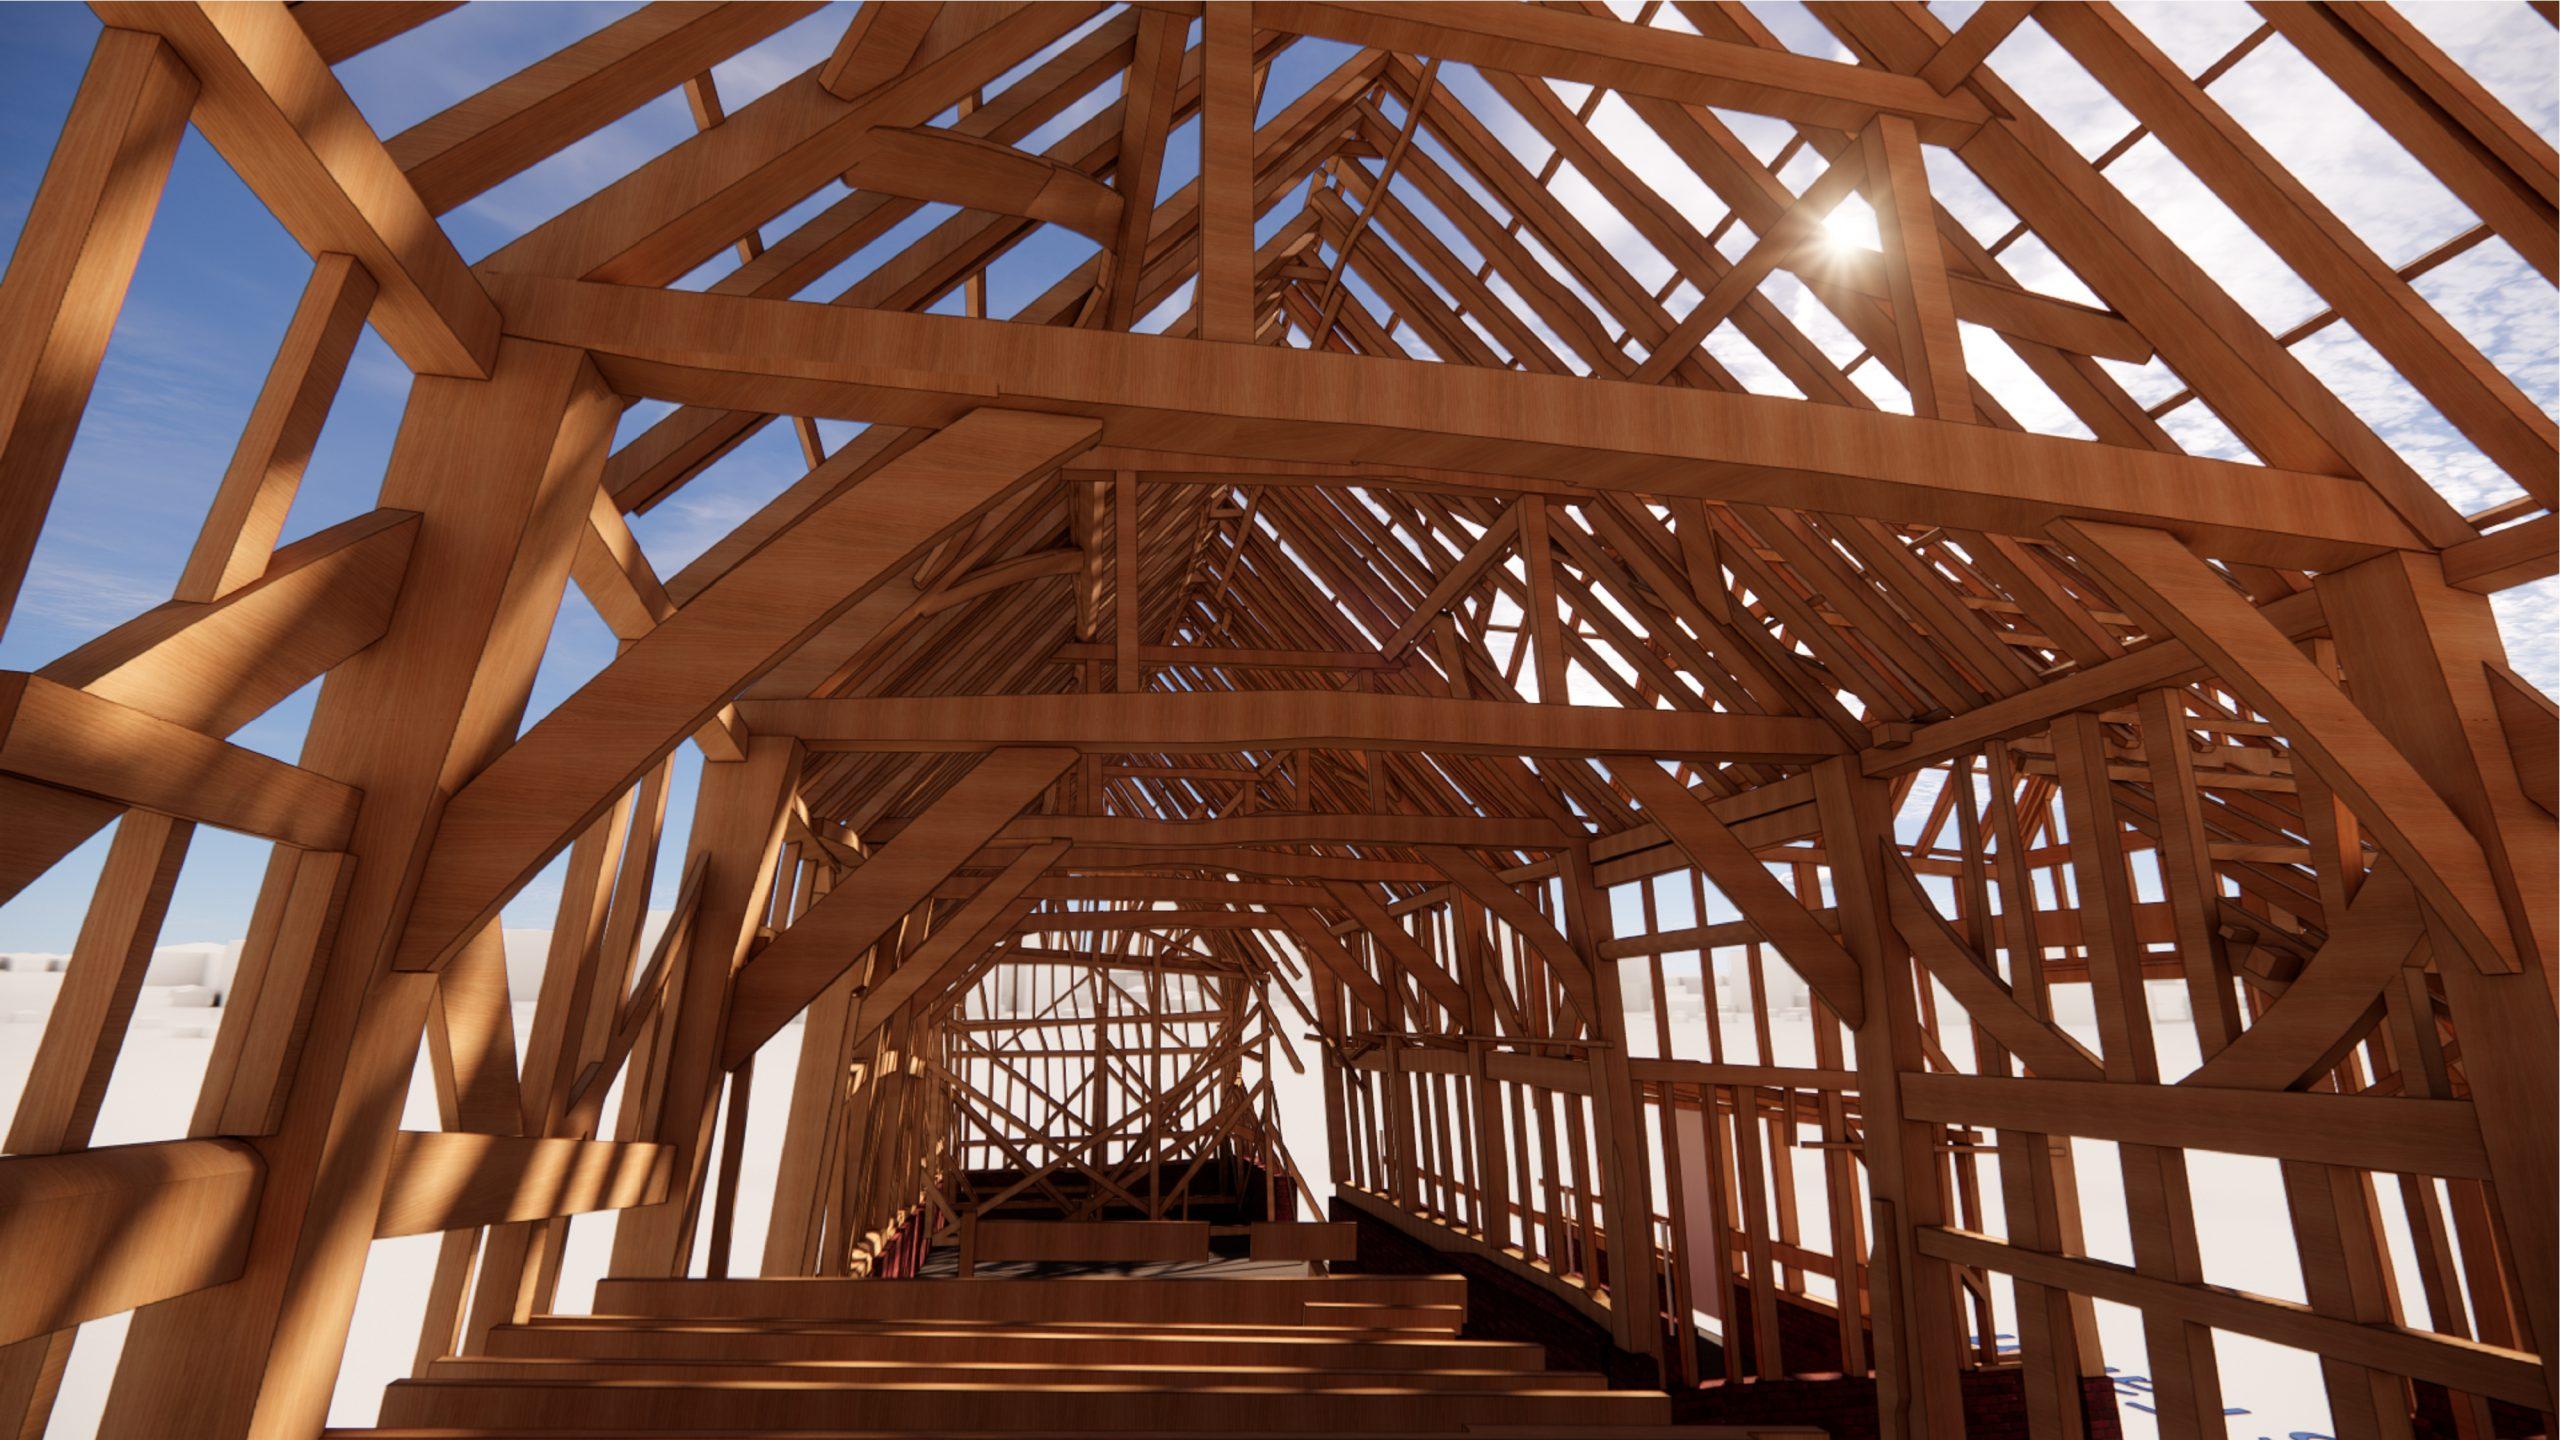 Inside view of Whitewebbs Farm - Rendering - 3D